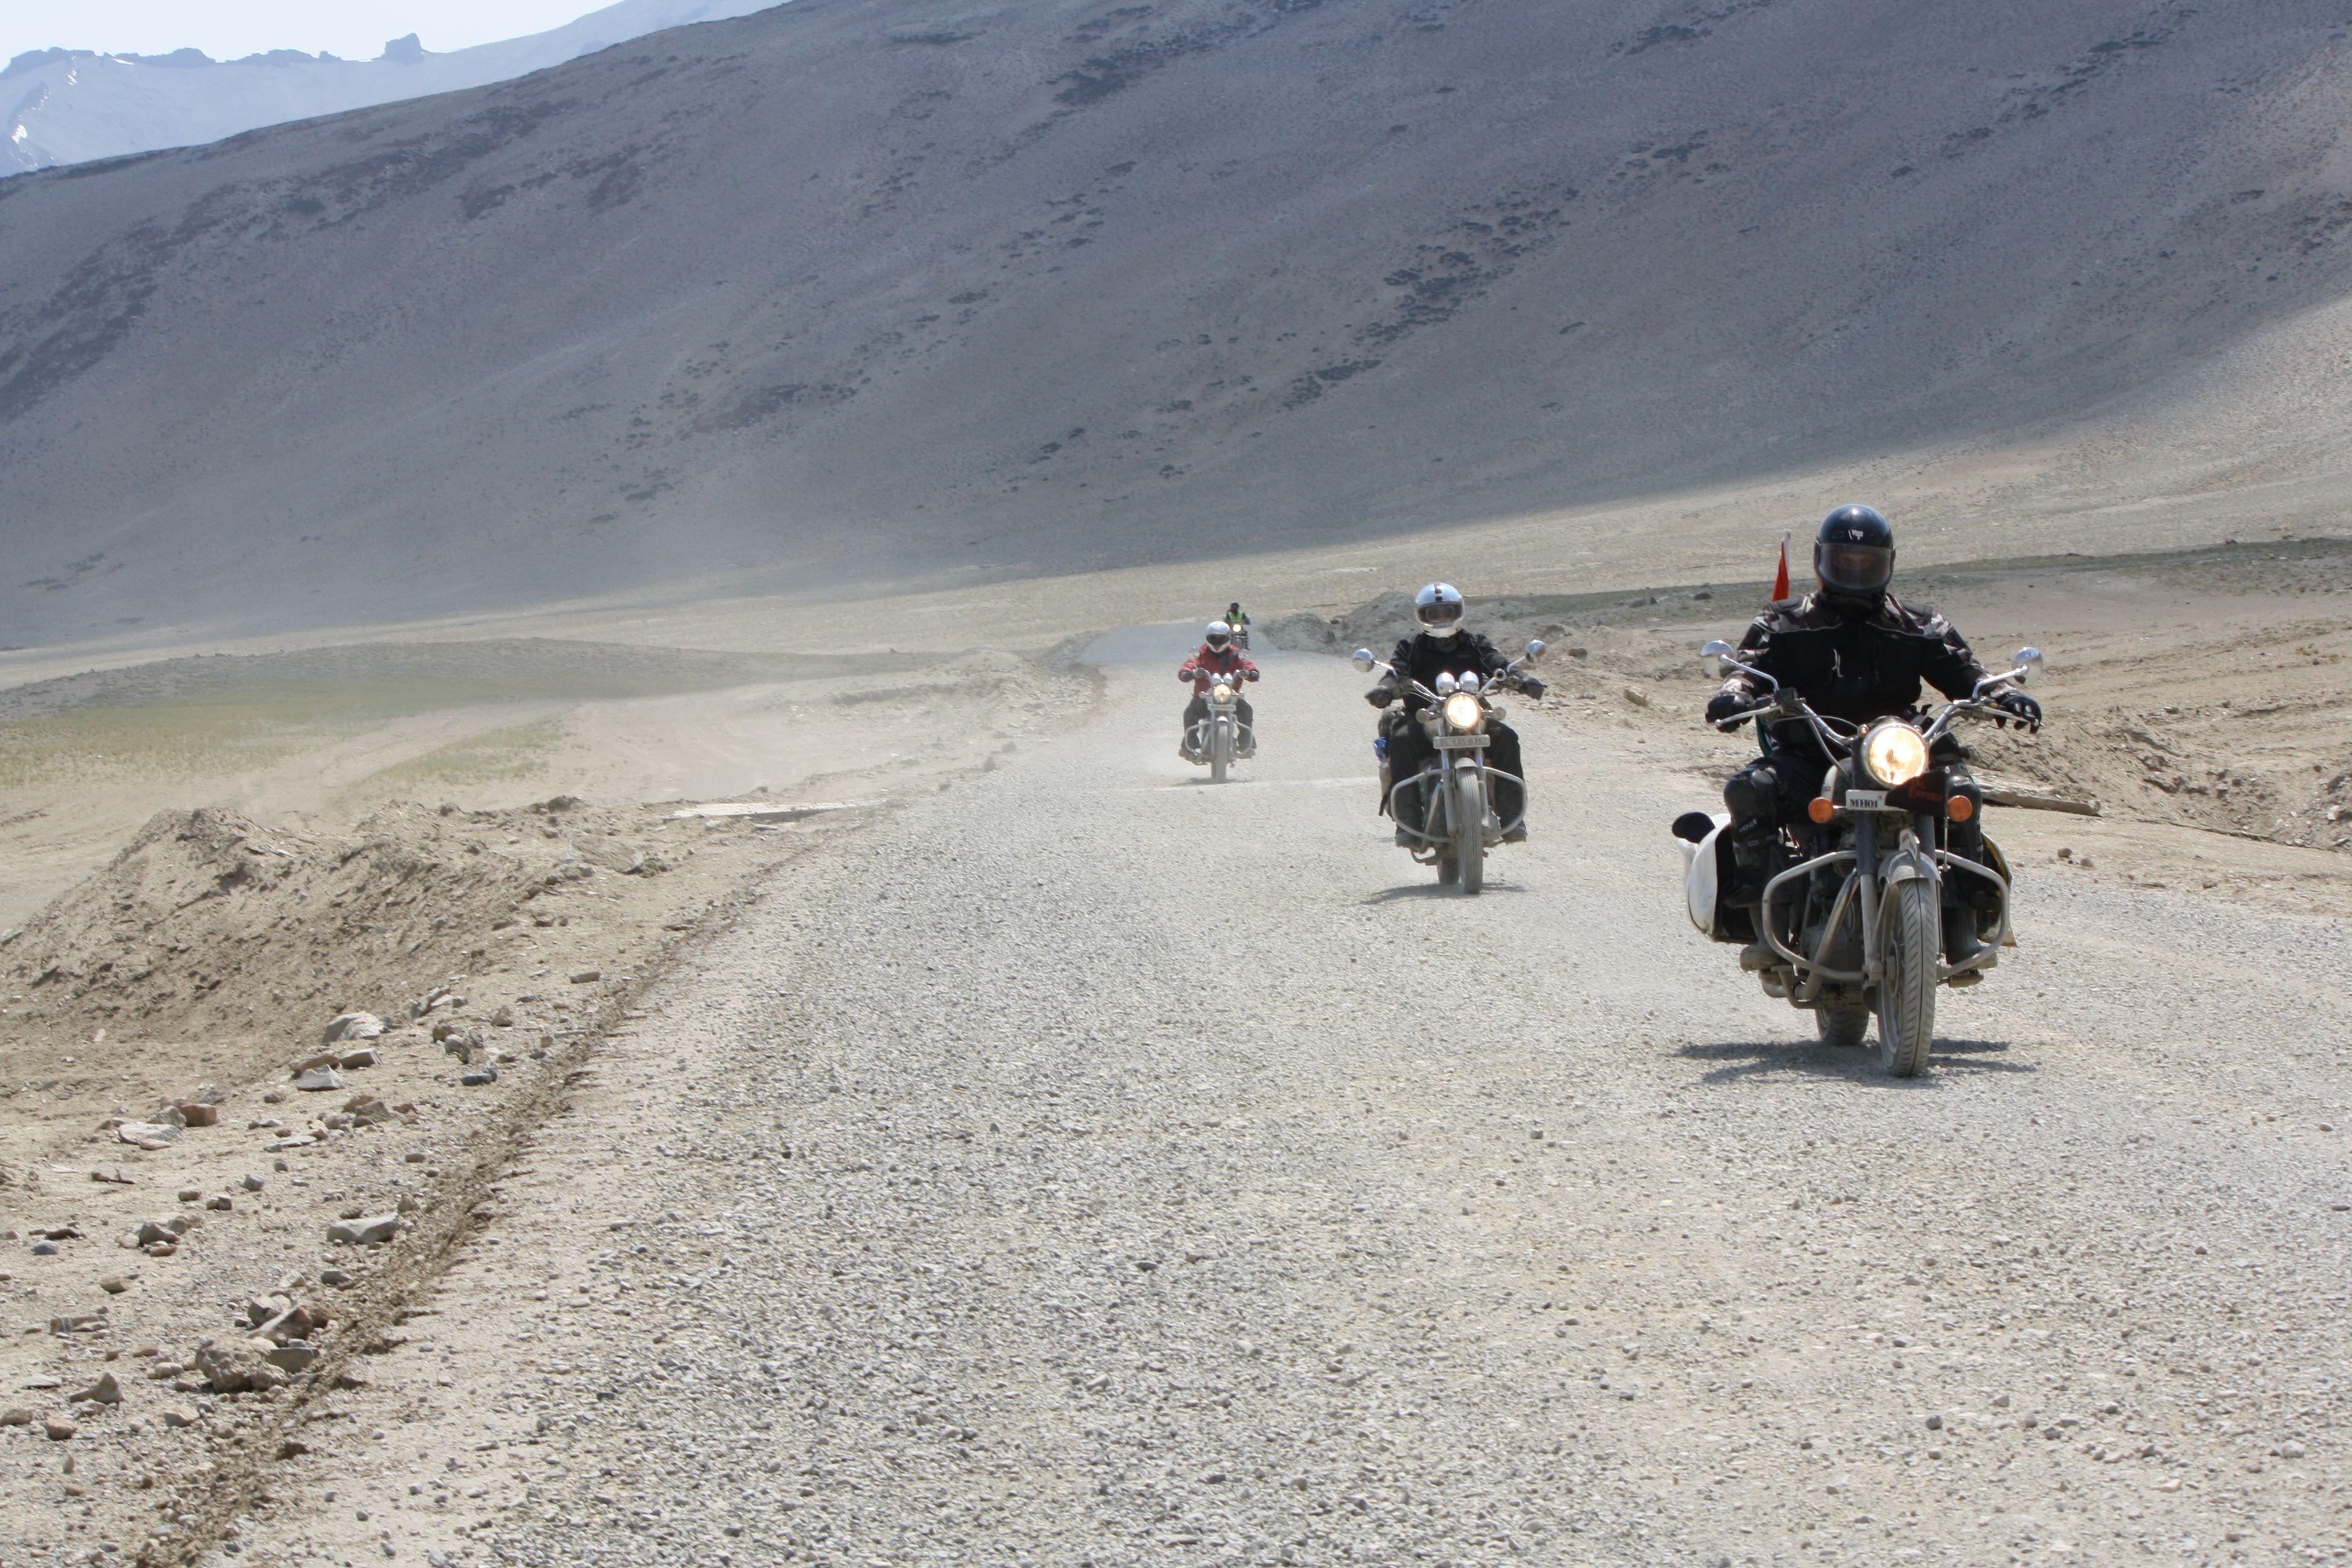 Img 4932 Jpg 3 888 2 592 Pixels Leh Ladakh North India Tour